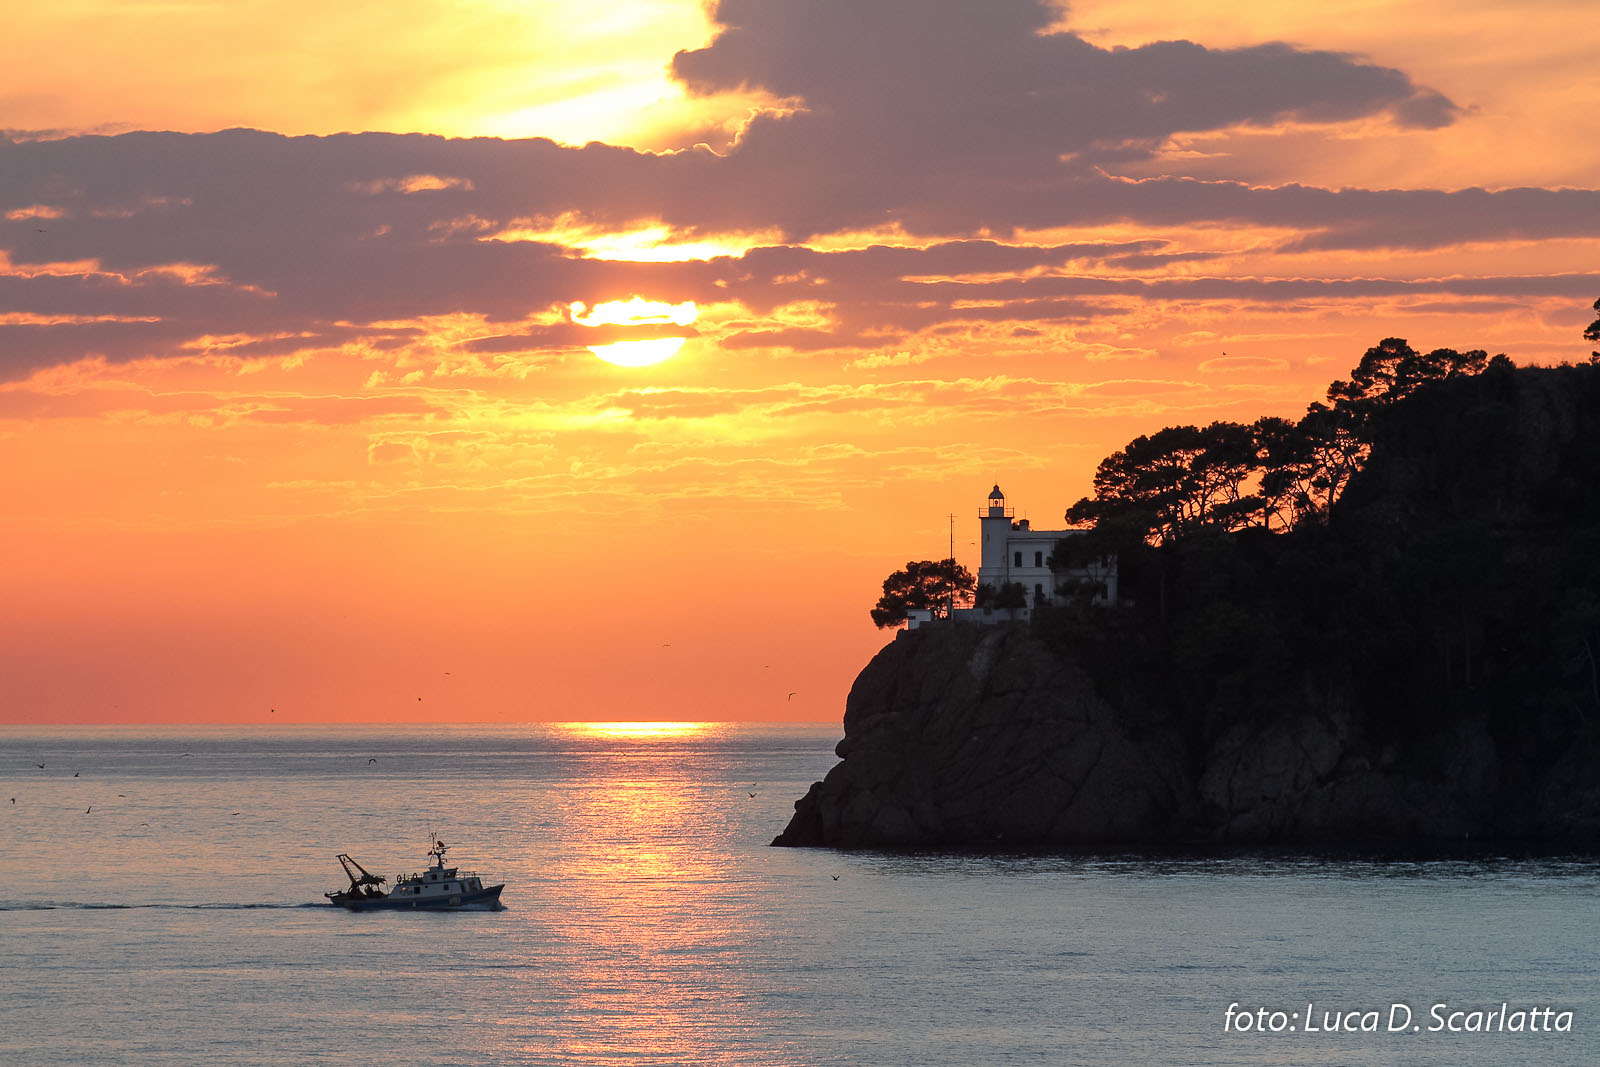 Arriving in Portofino...